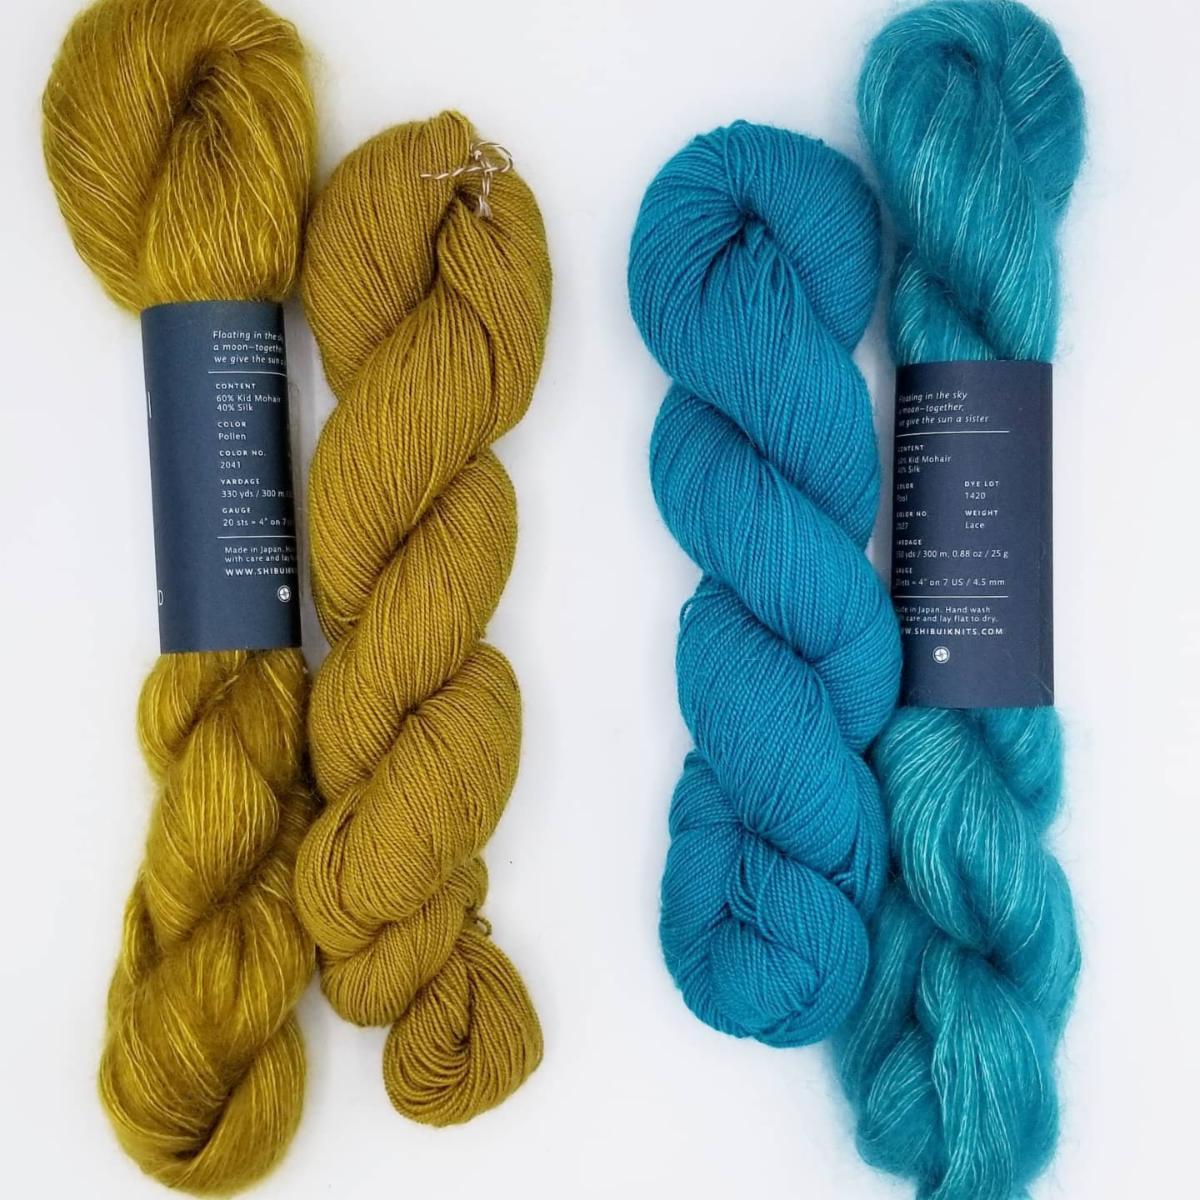 AQUA BLUE Sun and Wind Farm Free Shipping to U.S. Hand Dyed Wool